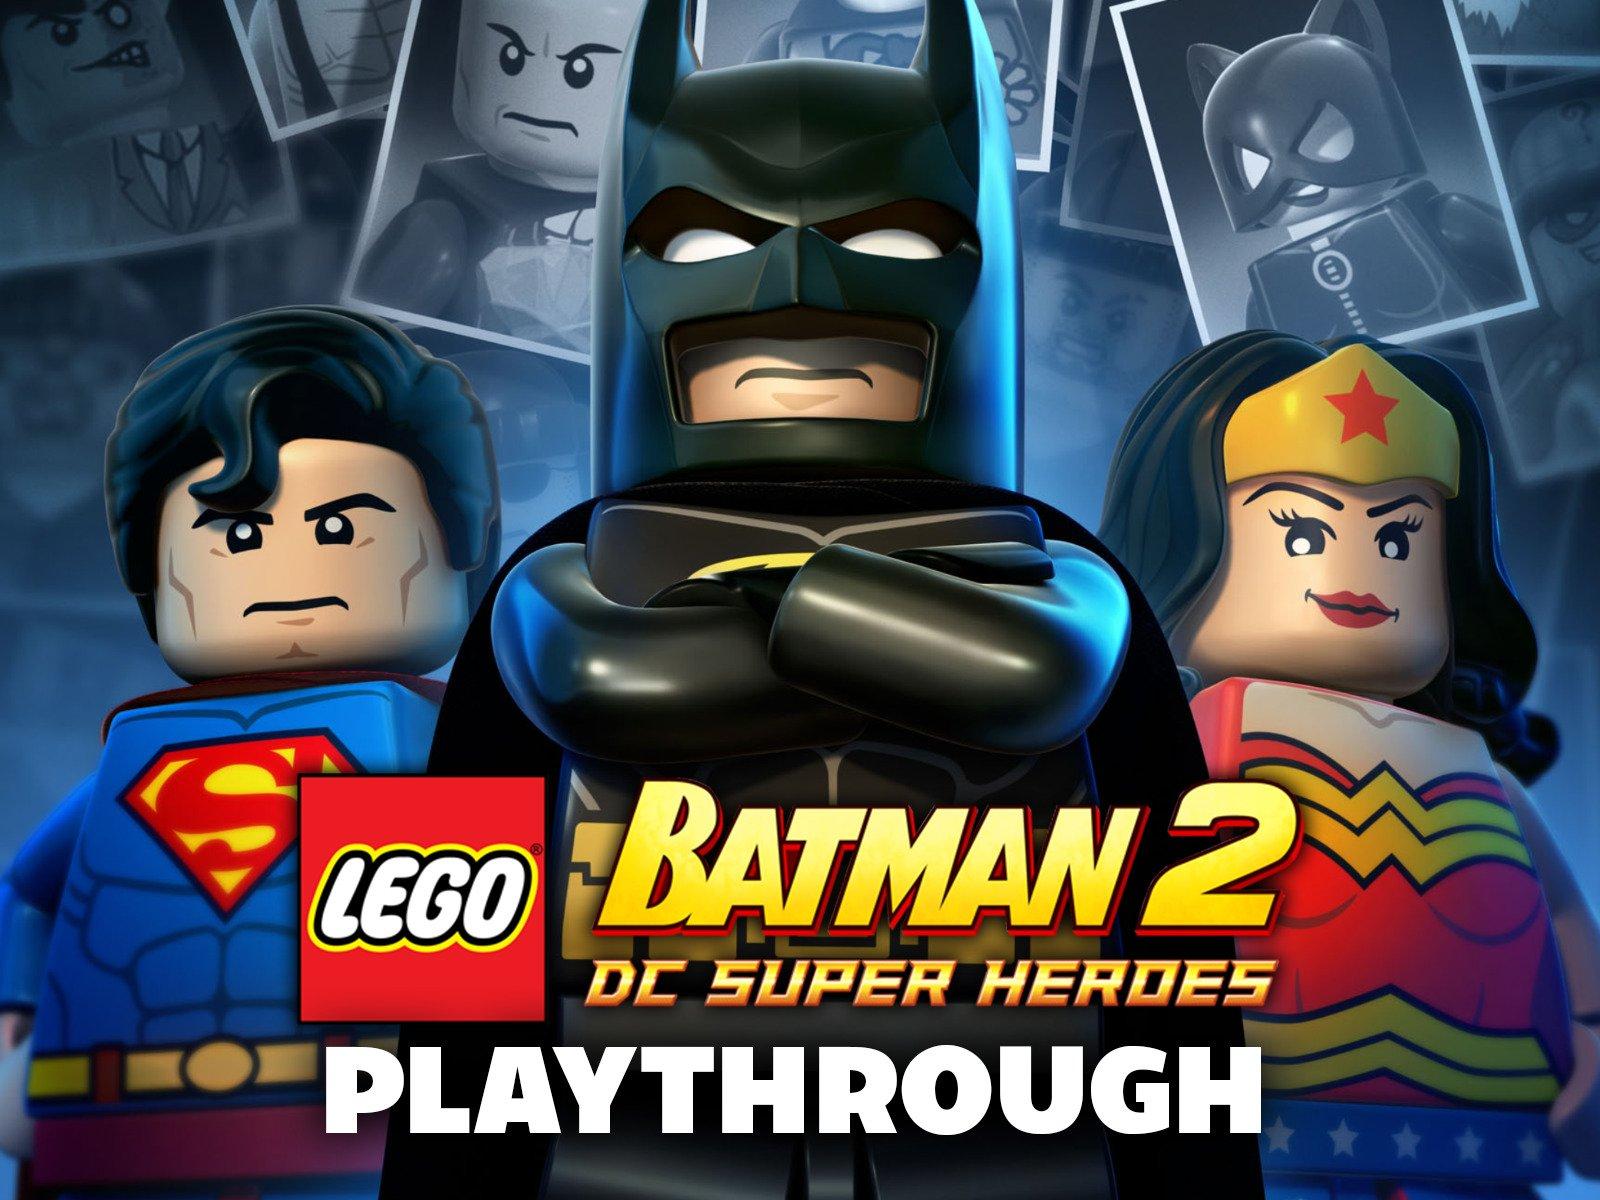 Clip: Lego Batman 2 : DC Super Heroes Playthrough - Season 1